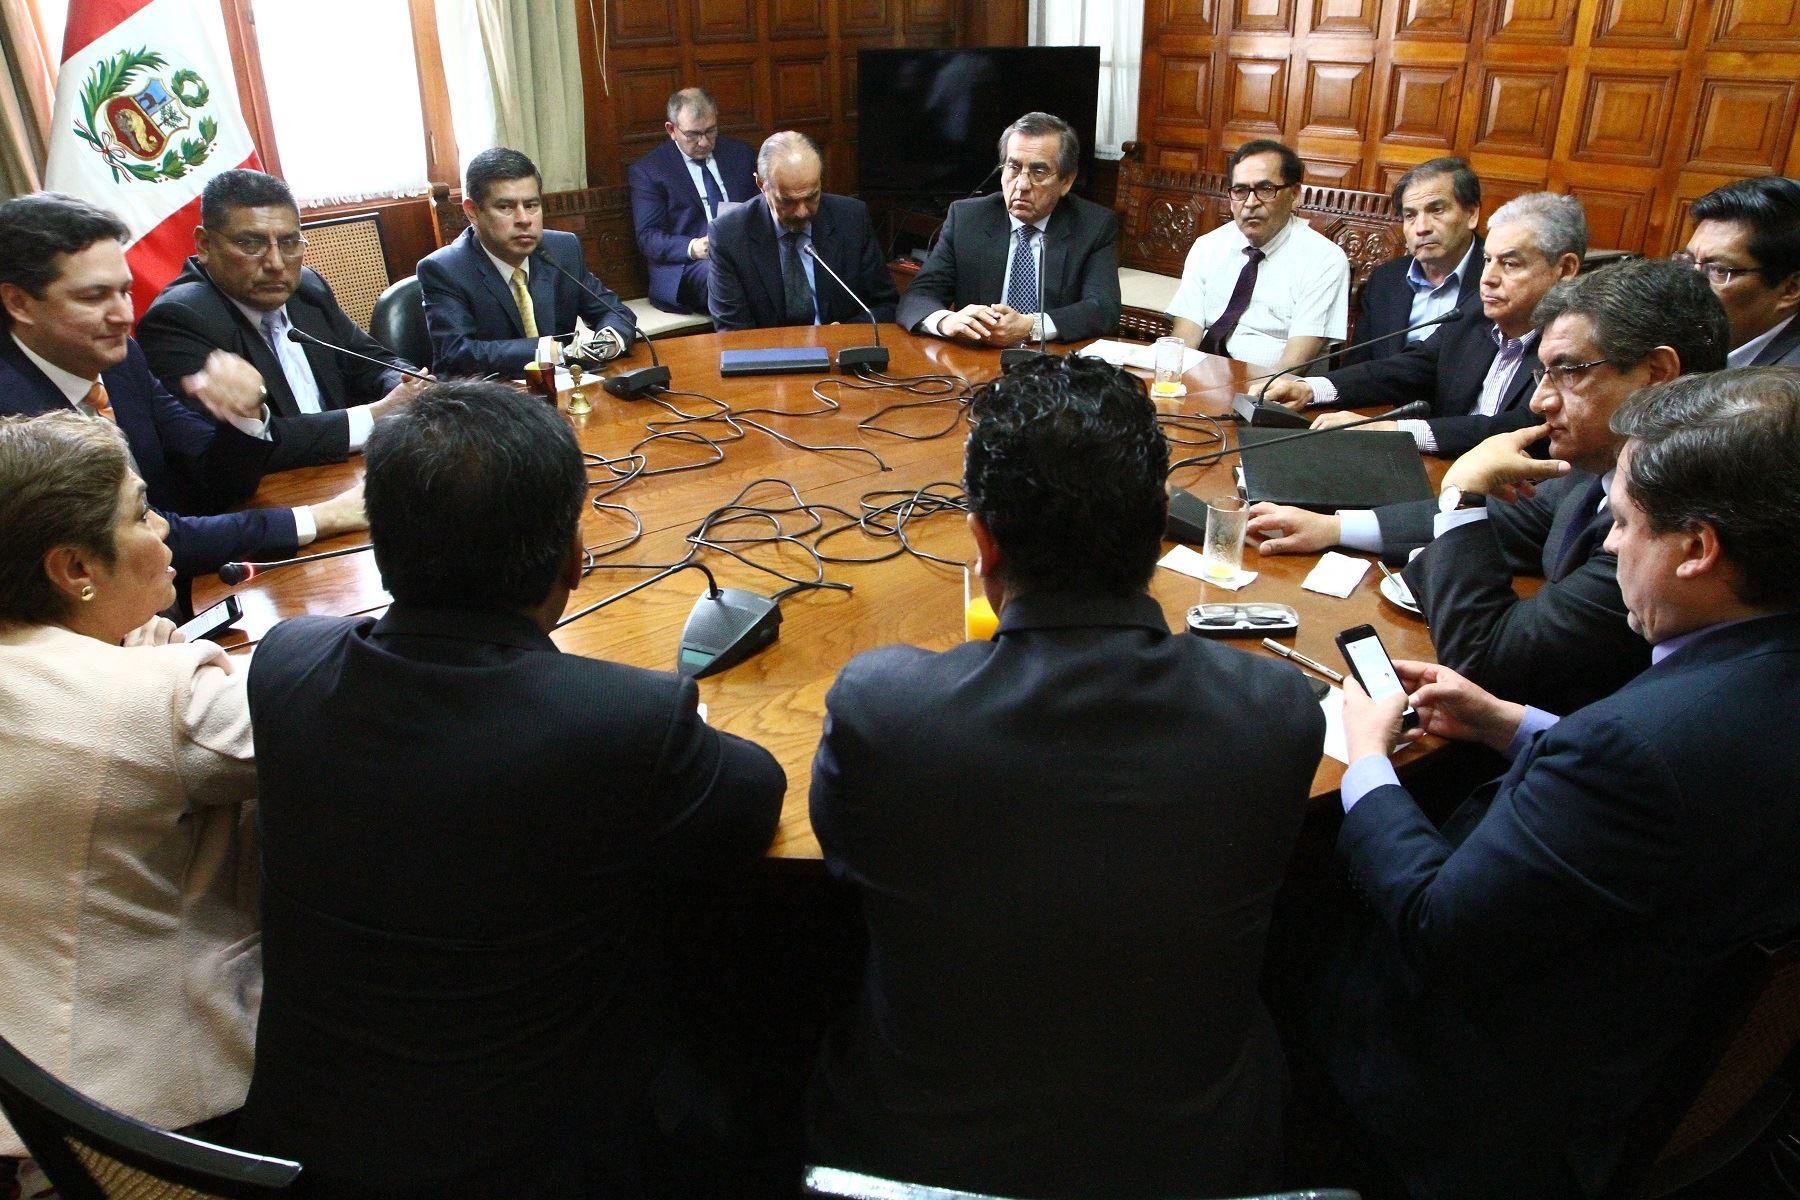 Felicita a Ecuador por la consulta